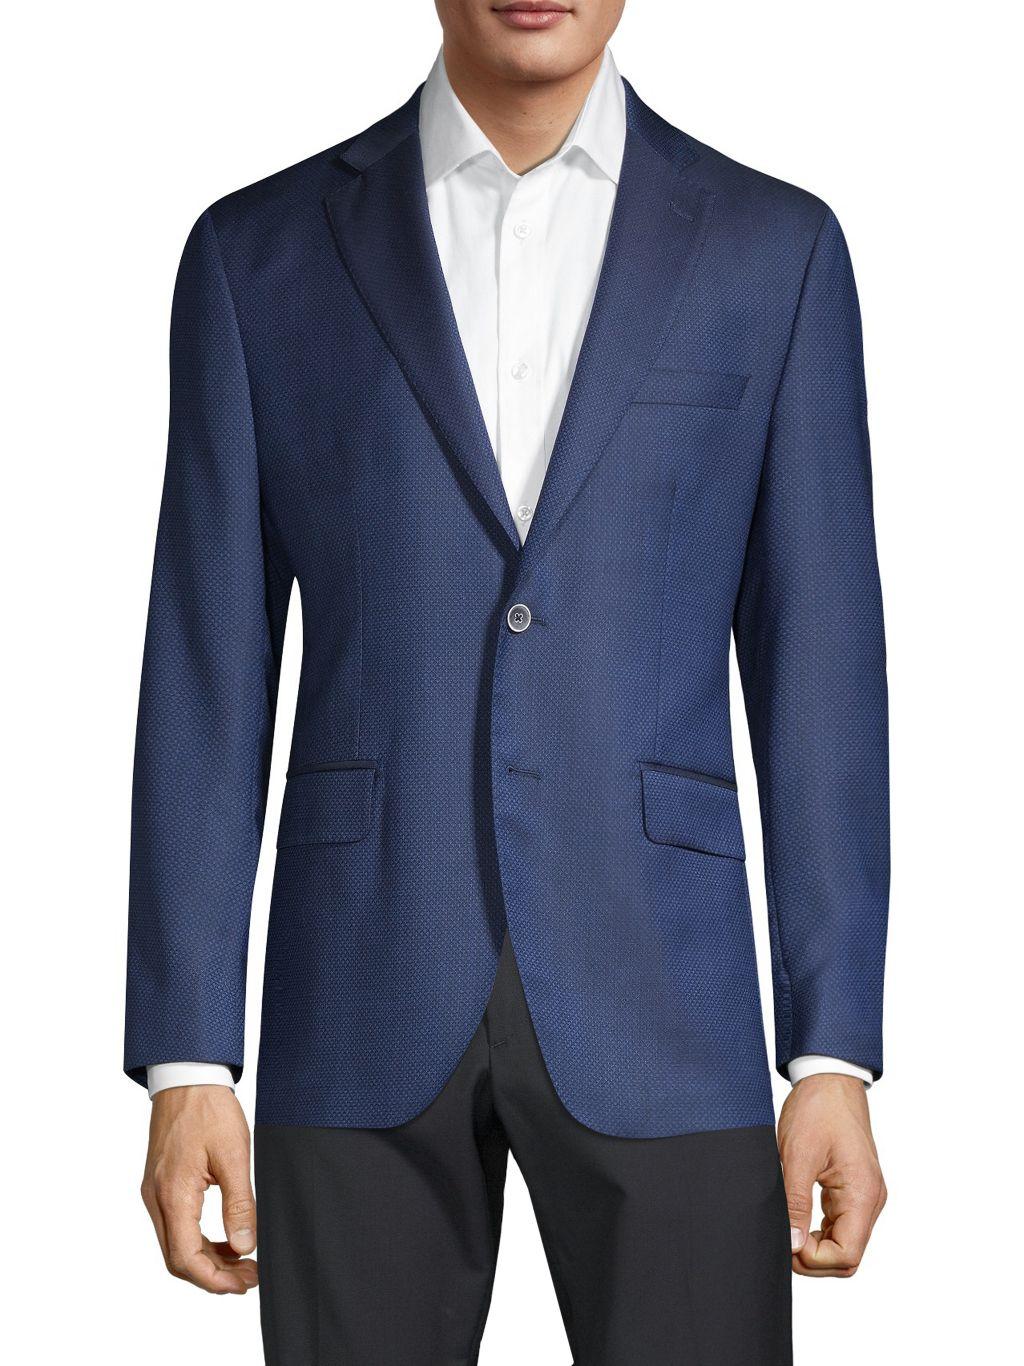 Saks Fifth Avenue Made in Italy Regular-Fit Textured Wool & Silk Blazer